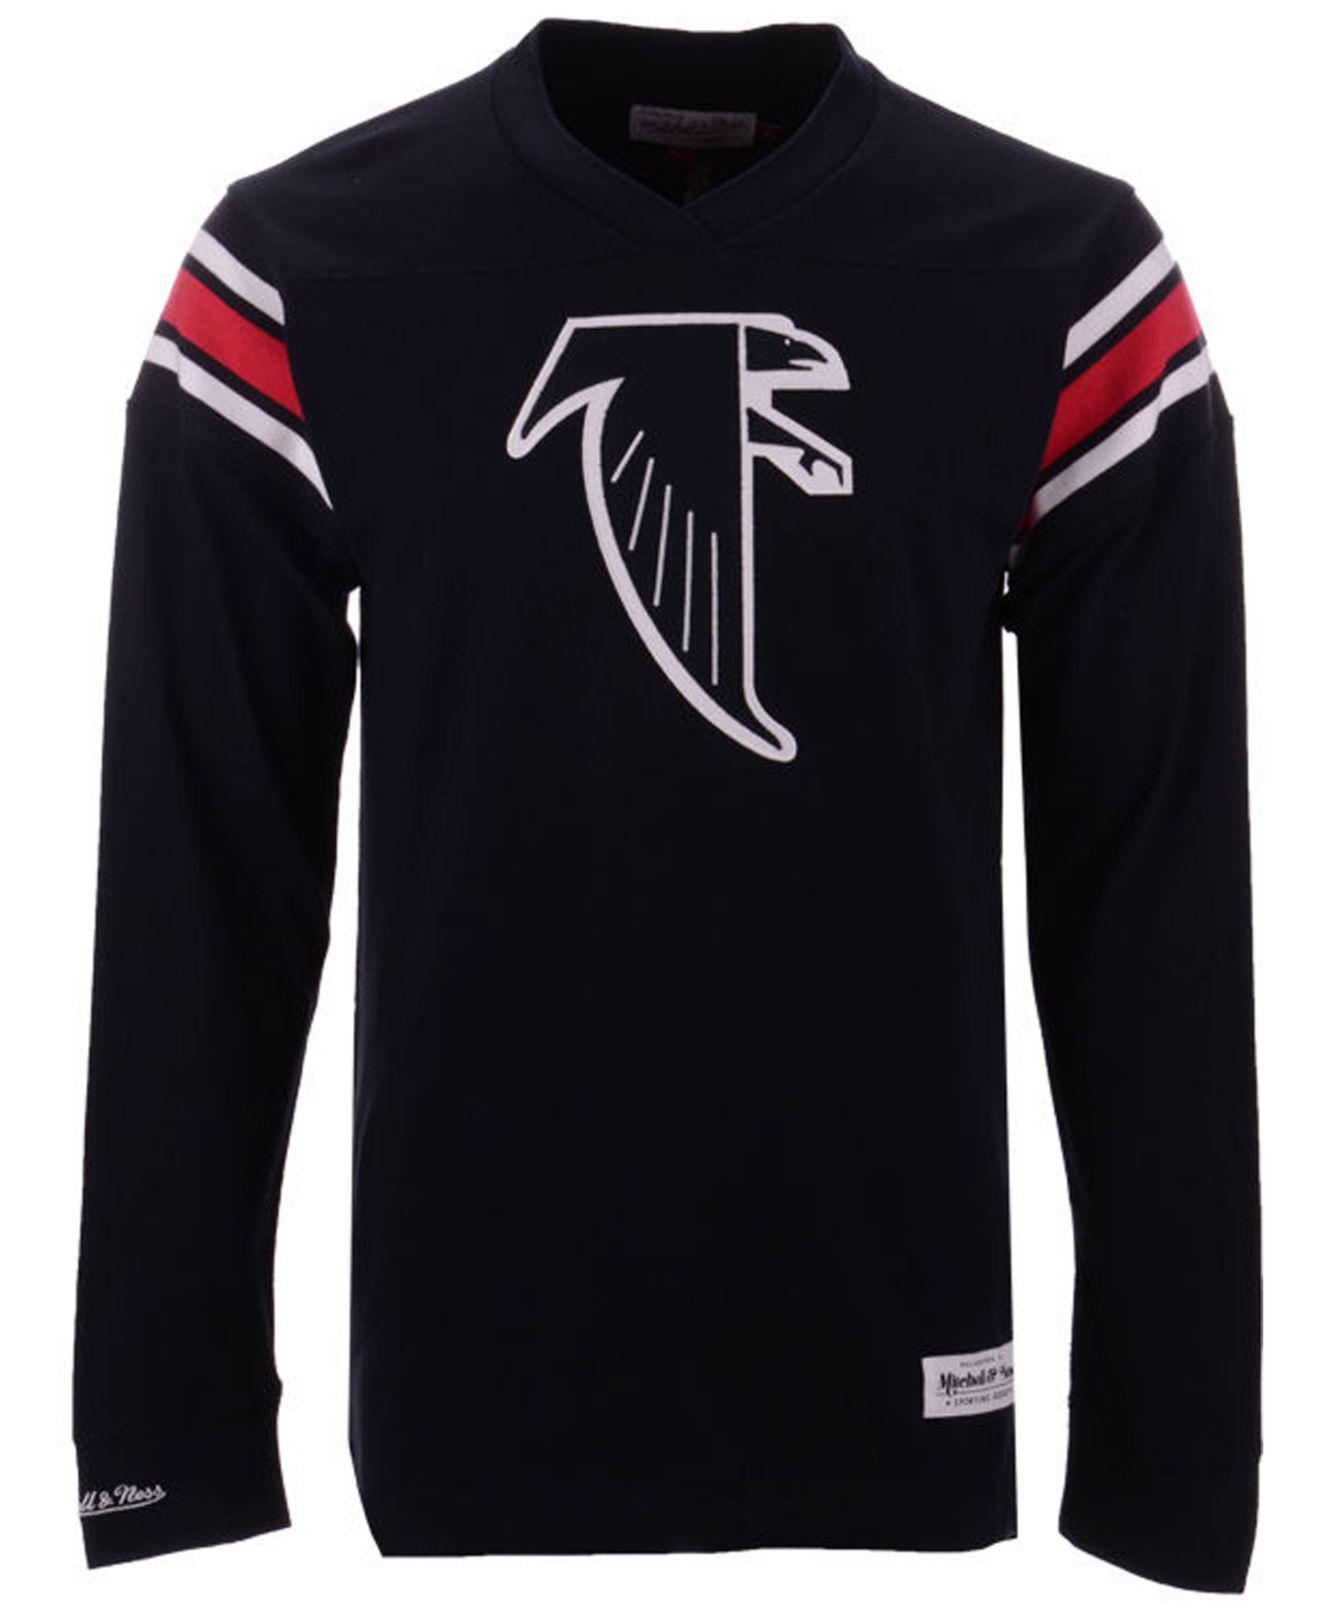 d5c59792d Lyst - Mitchell   Ness Atlanta Falcons Team Captain V-neck Long ...